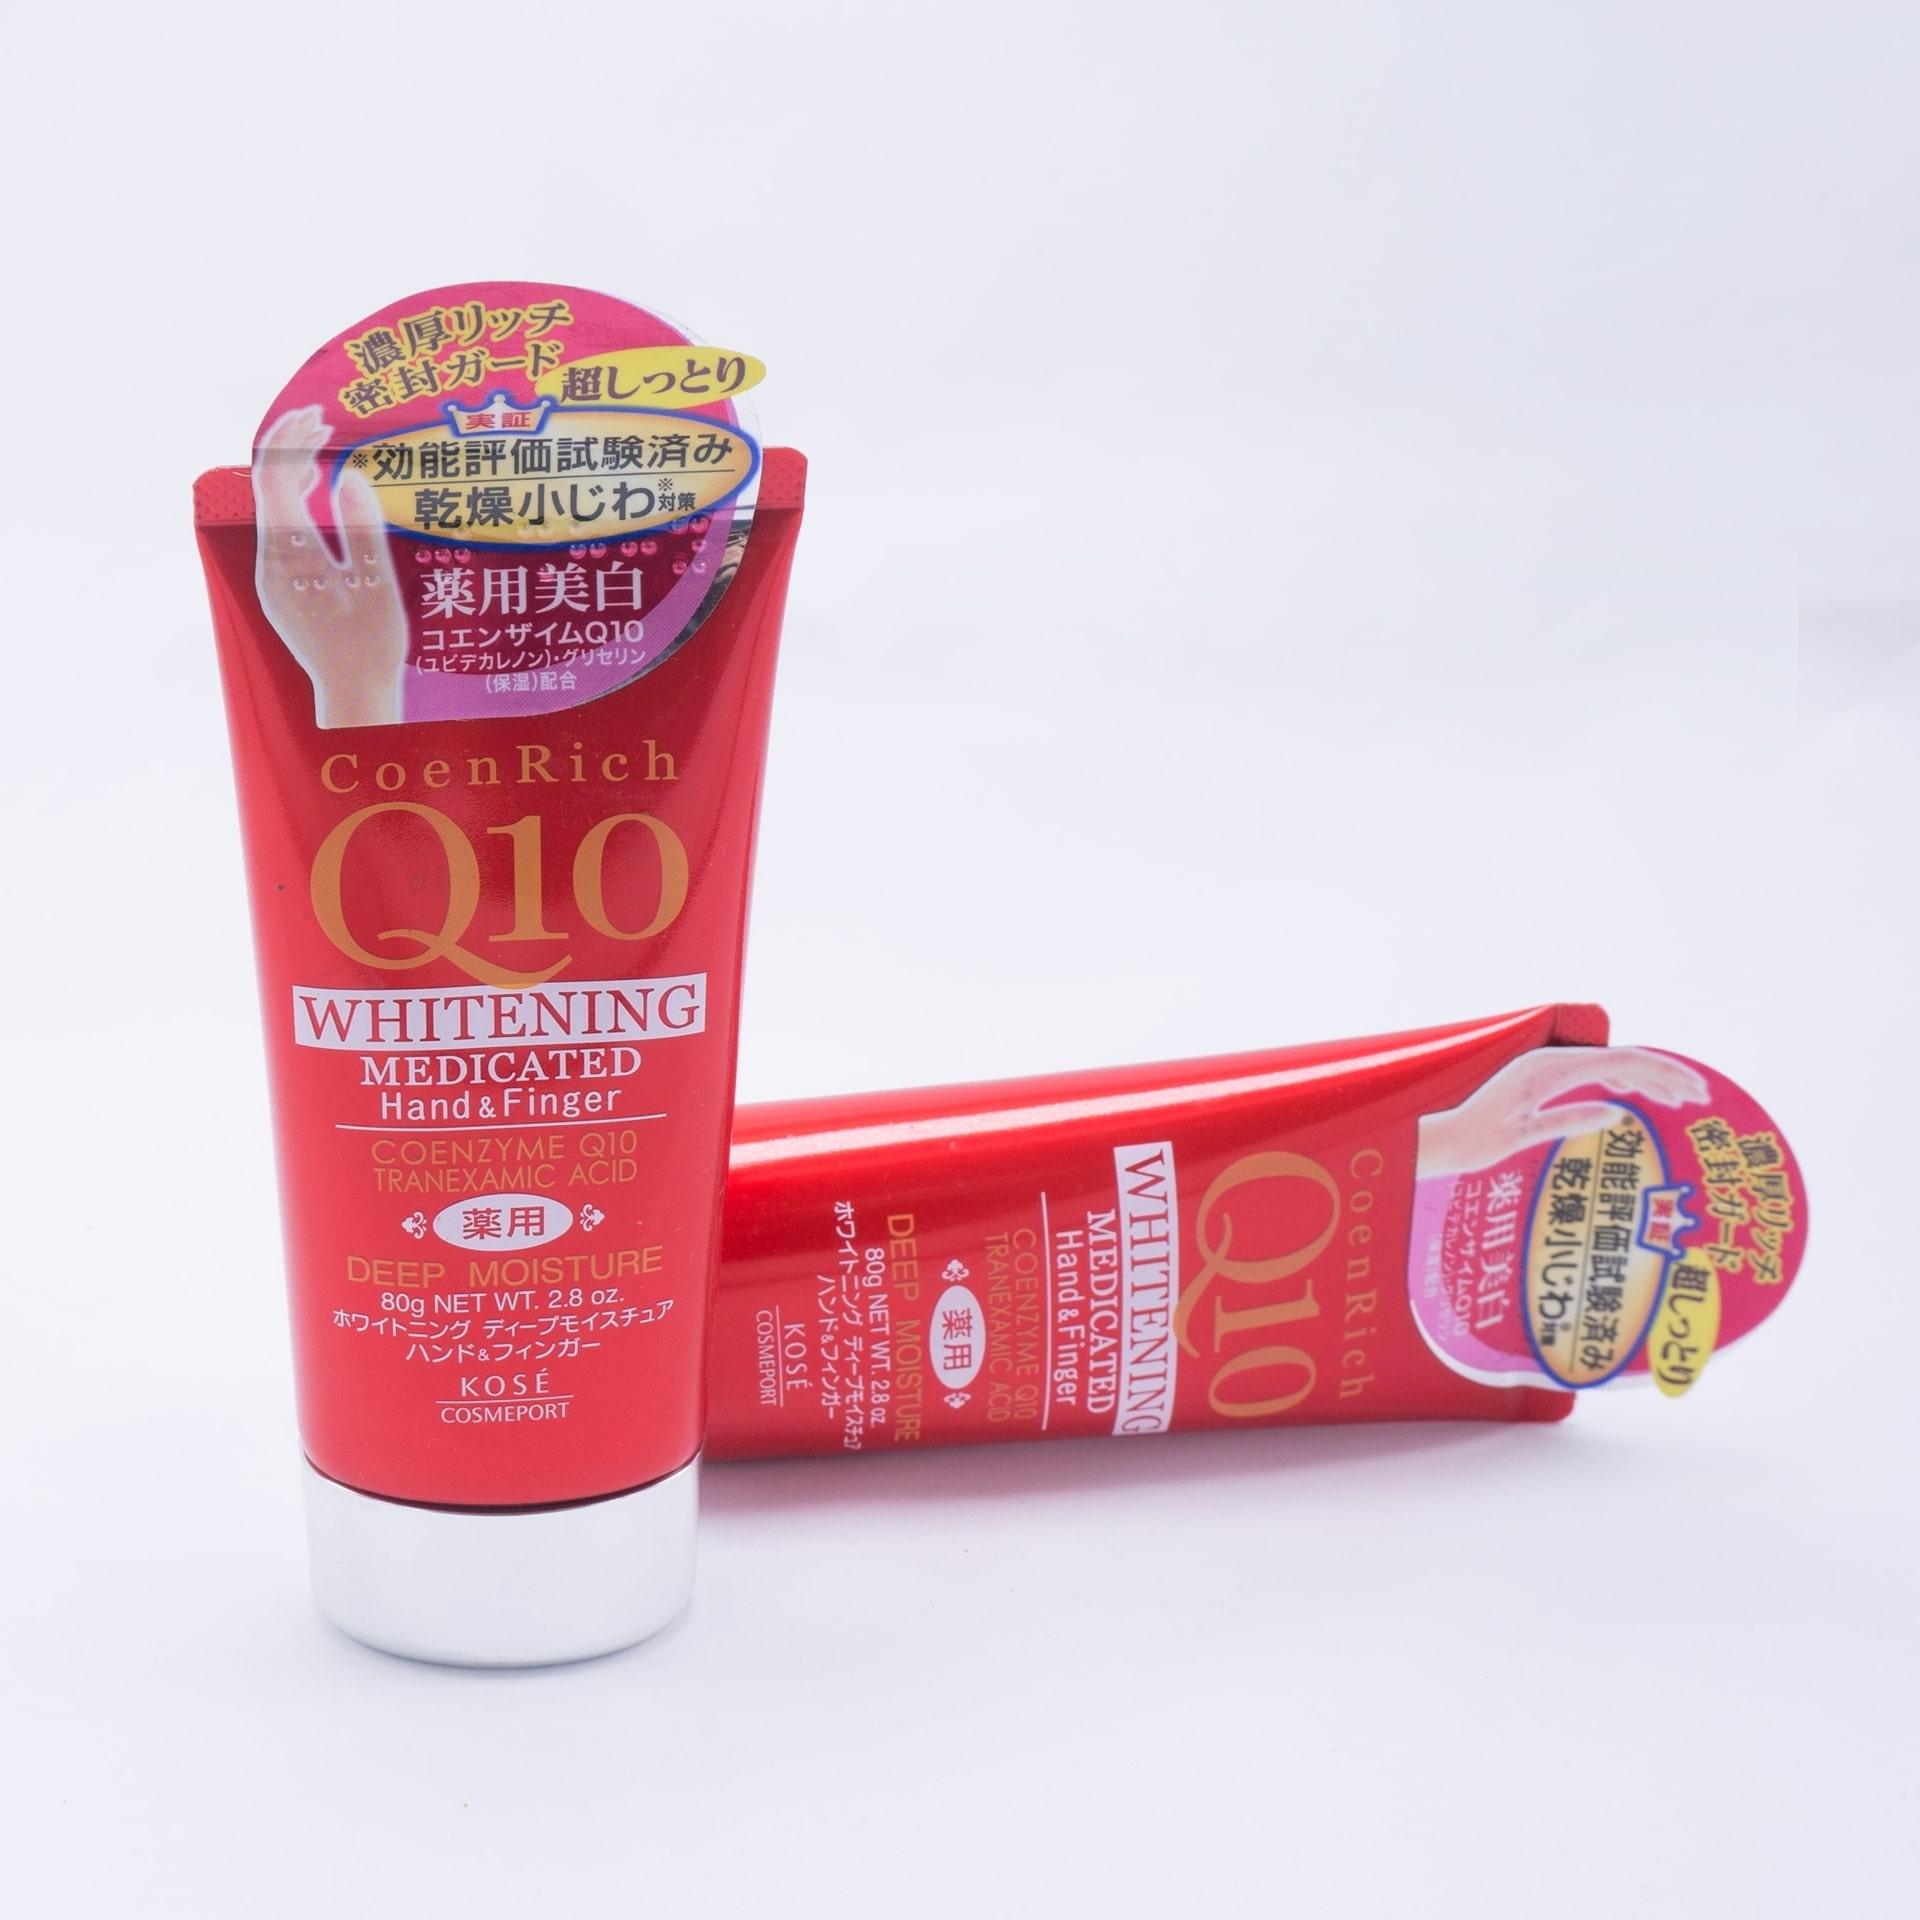 Kem dưỡng da kkose Q10 whitening medicated